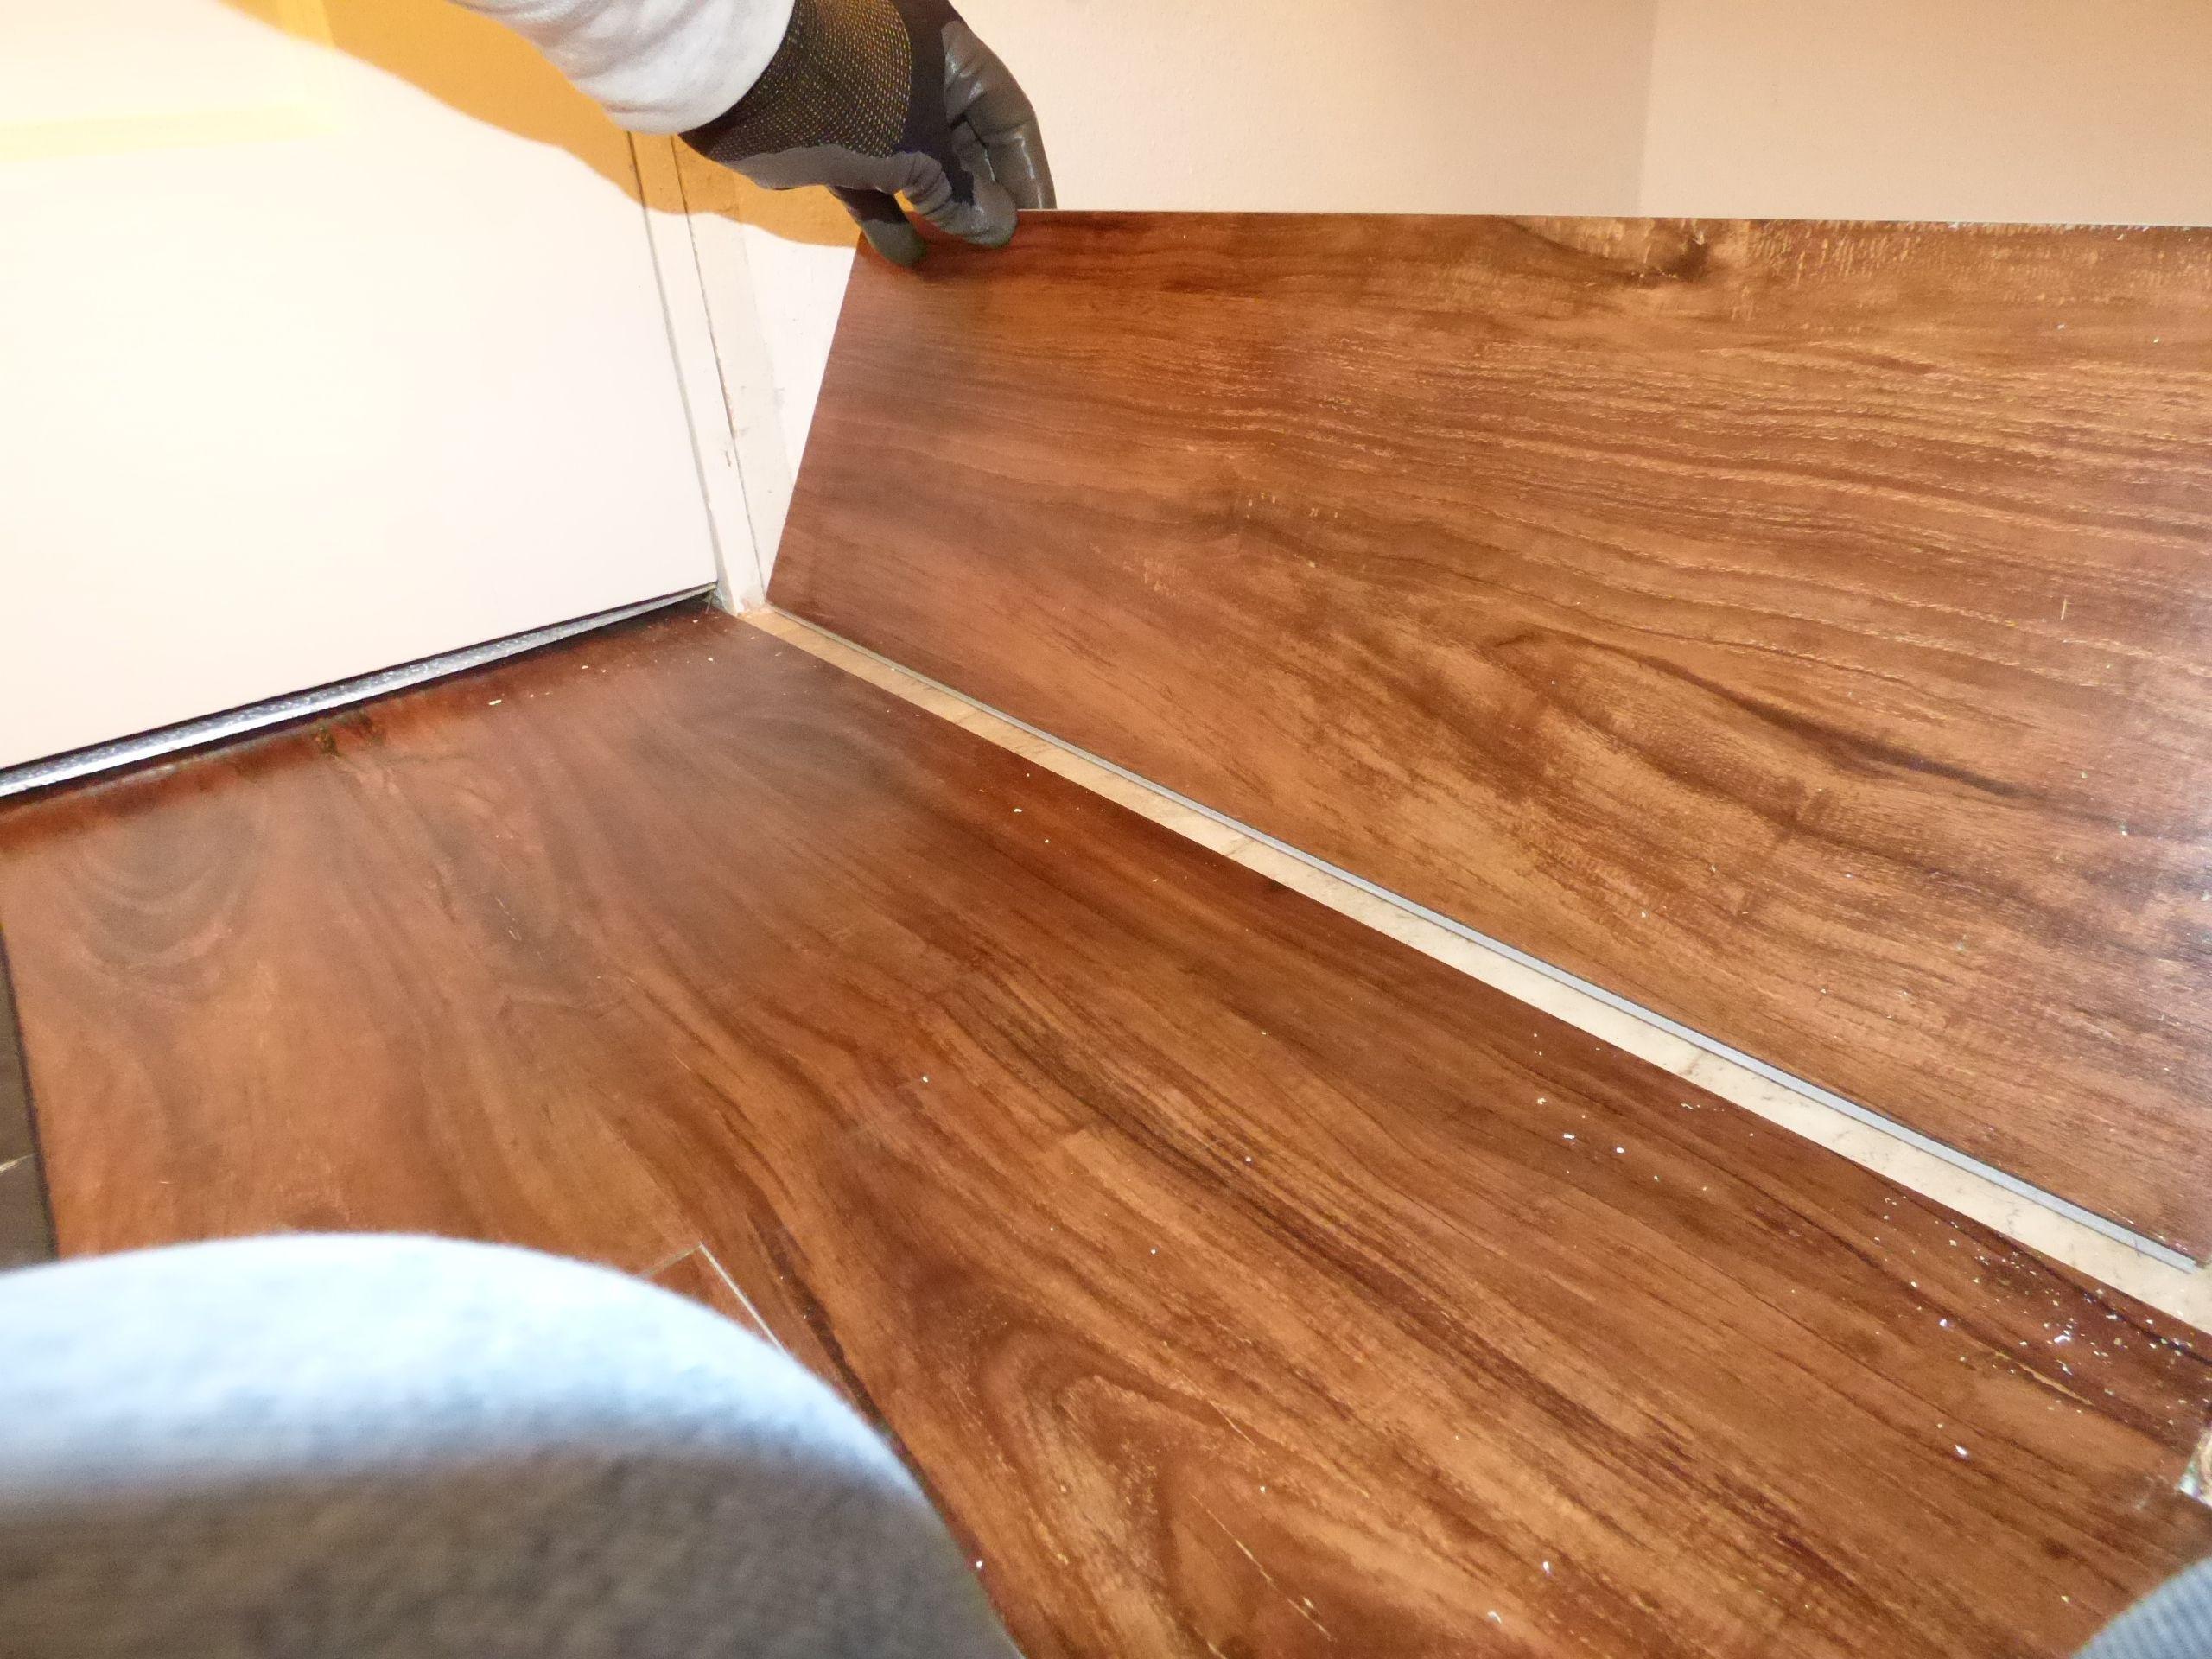 hardwood floor stapler reviews of its easy and fast to install plank vinyl flooring intended for backwards installing plank flooring 56a4a0535f9b58b7d0d7e38e jpg